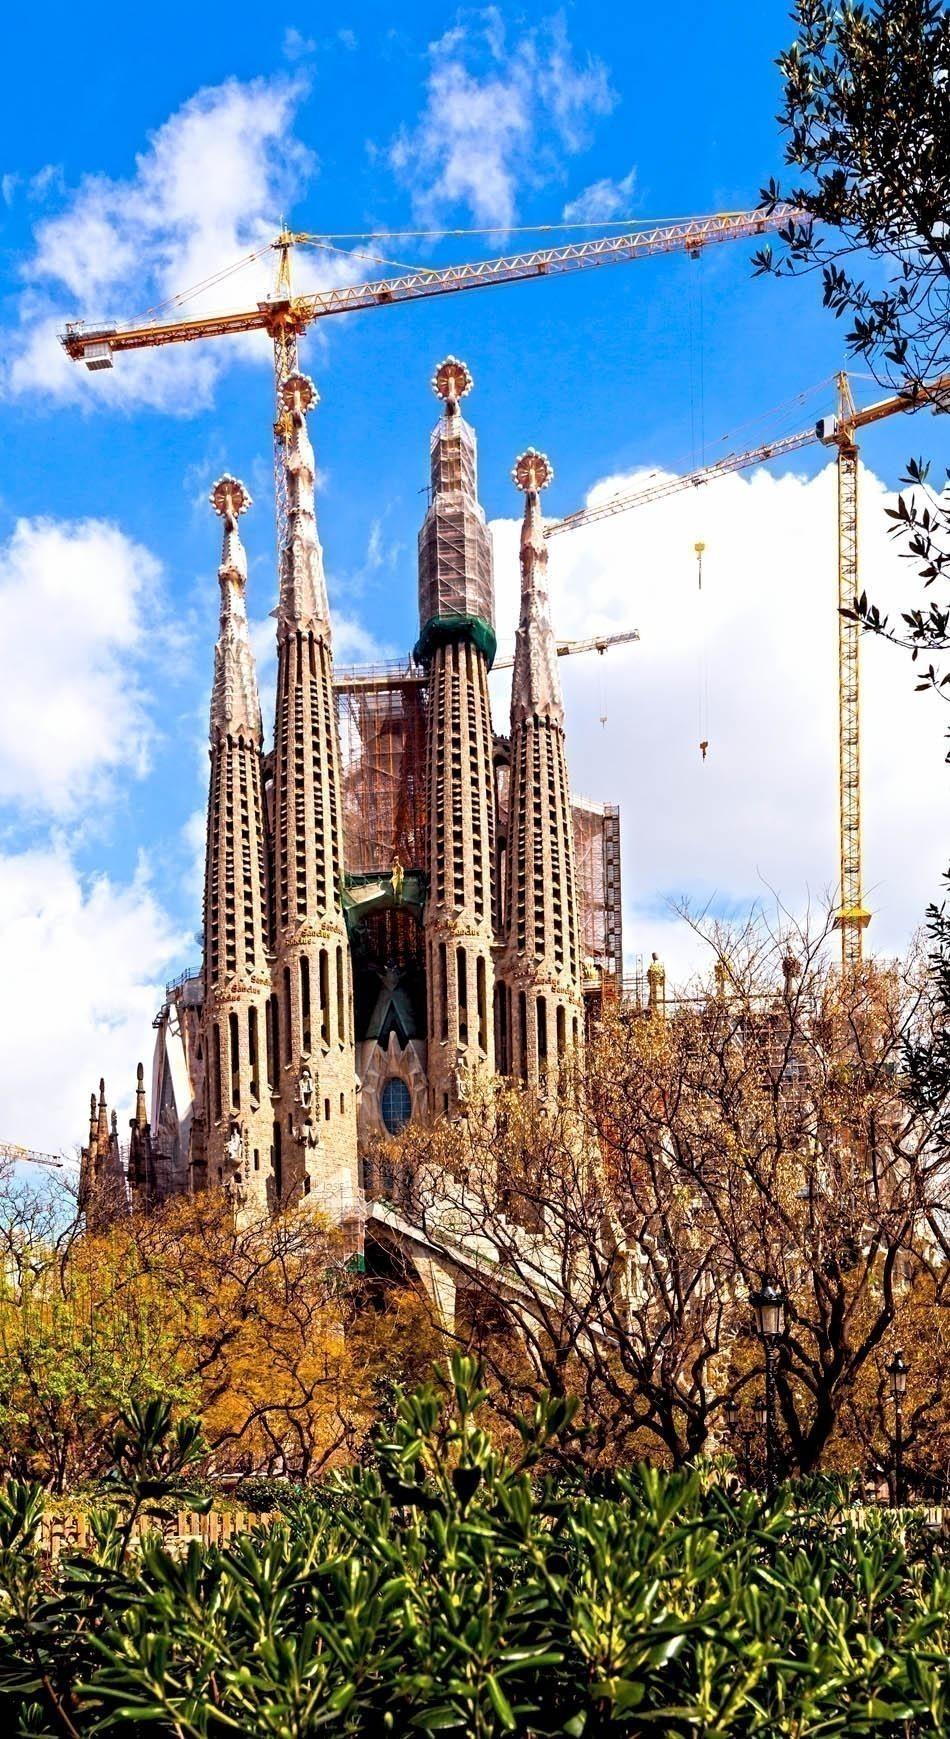 Famous Sagrada Familia in Barcelona | Spain Travel Guide